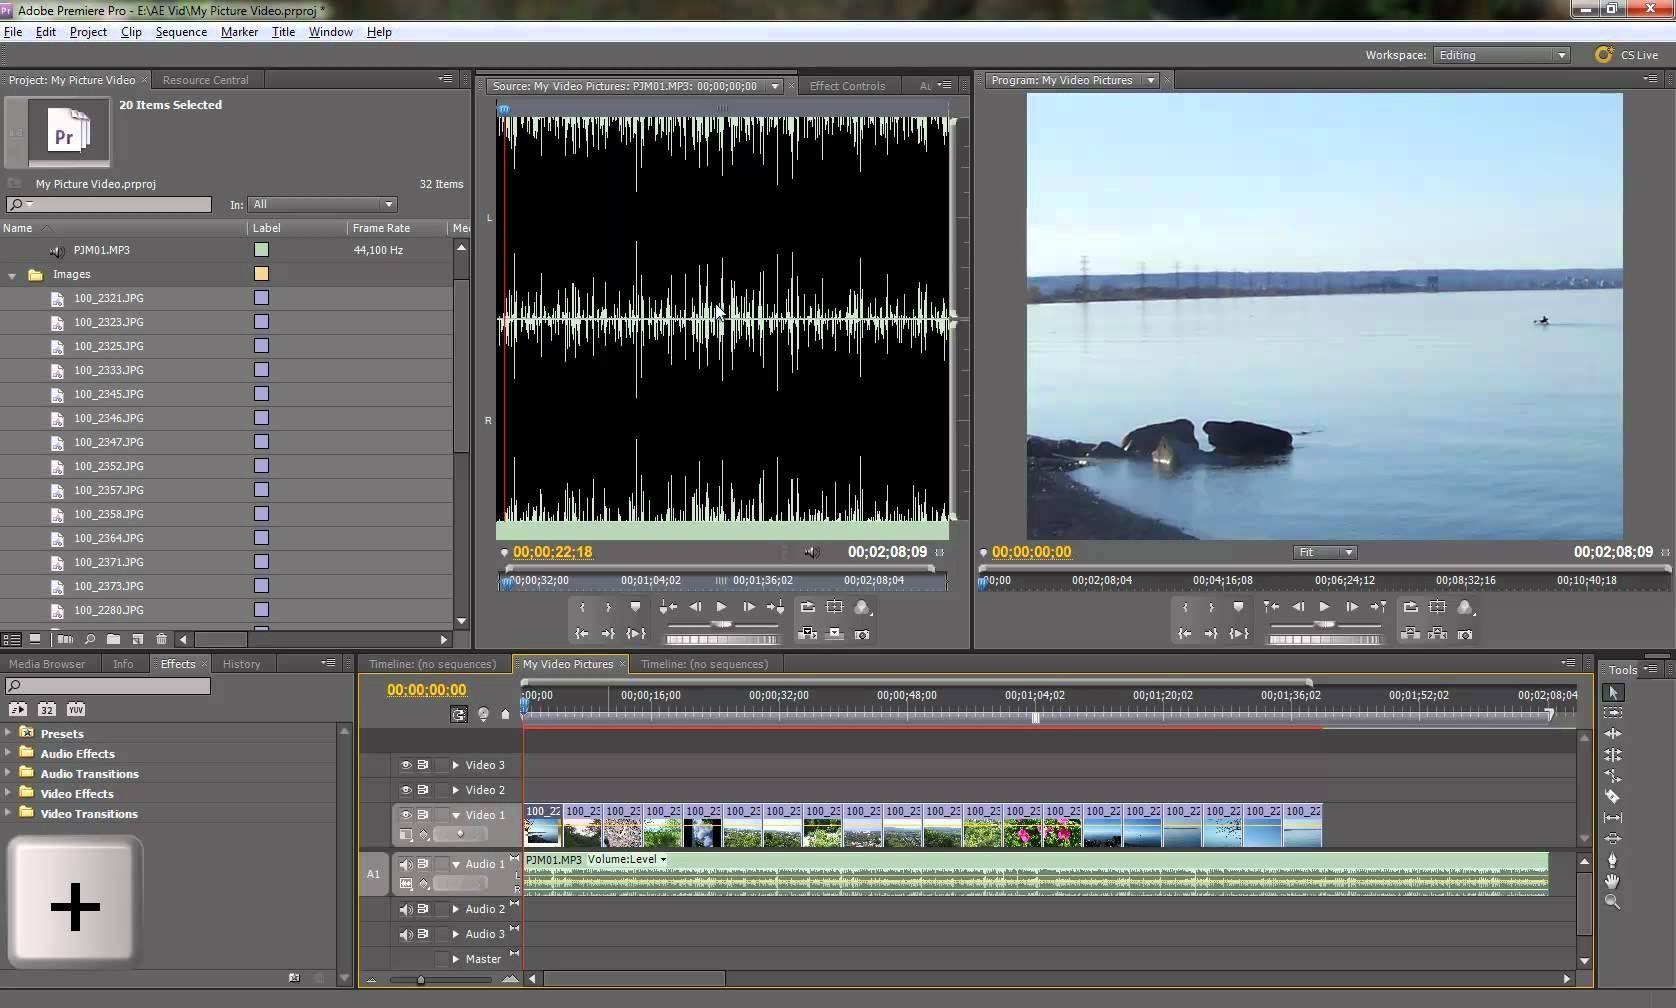 Free Slideshow Maker: Create Video Slideshows